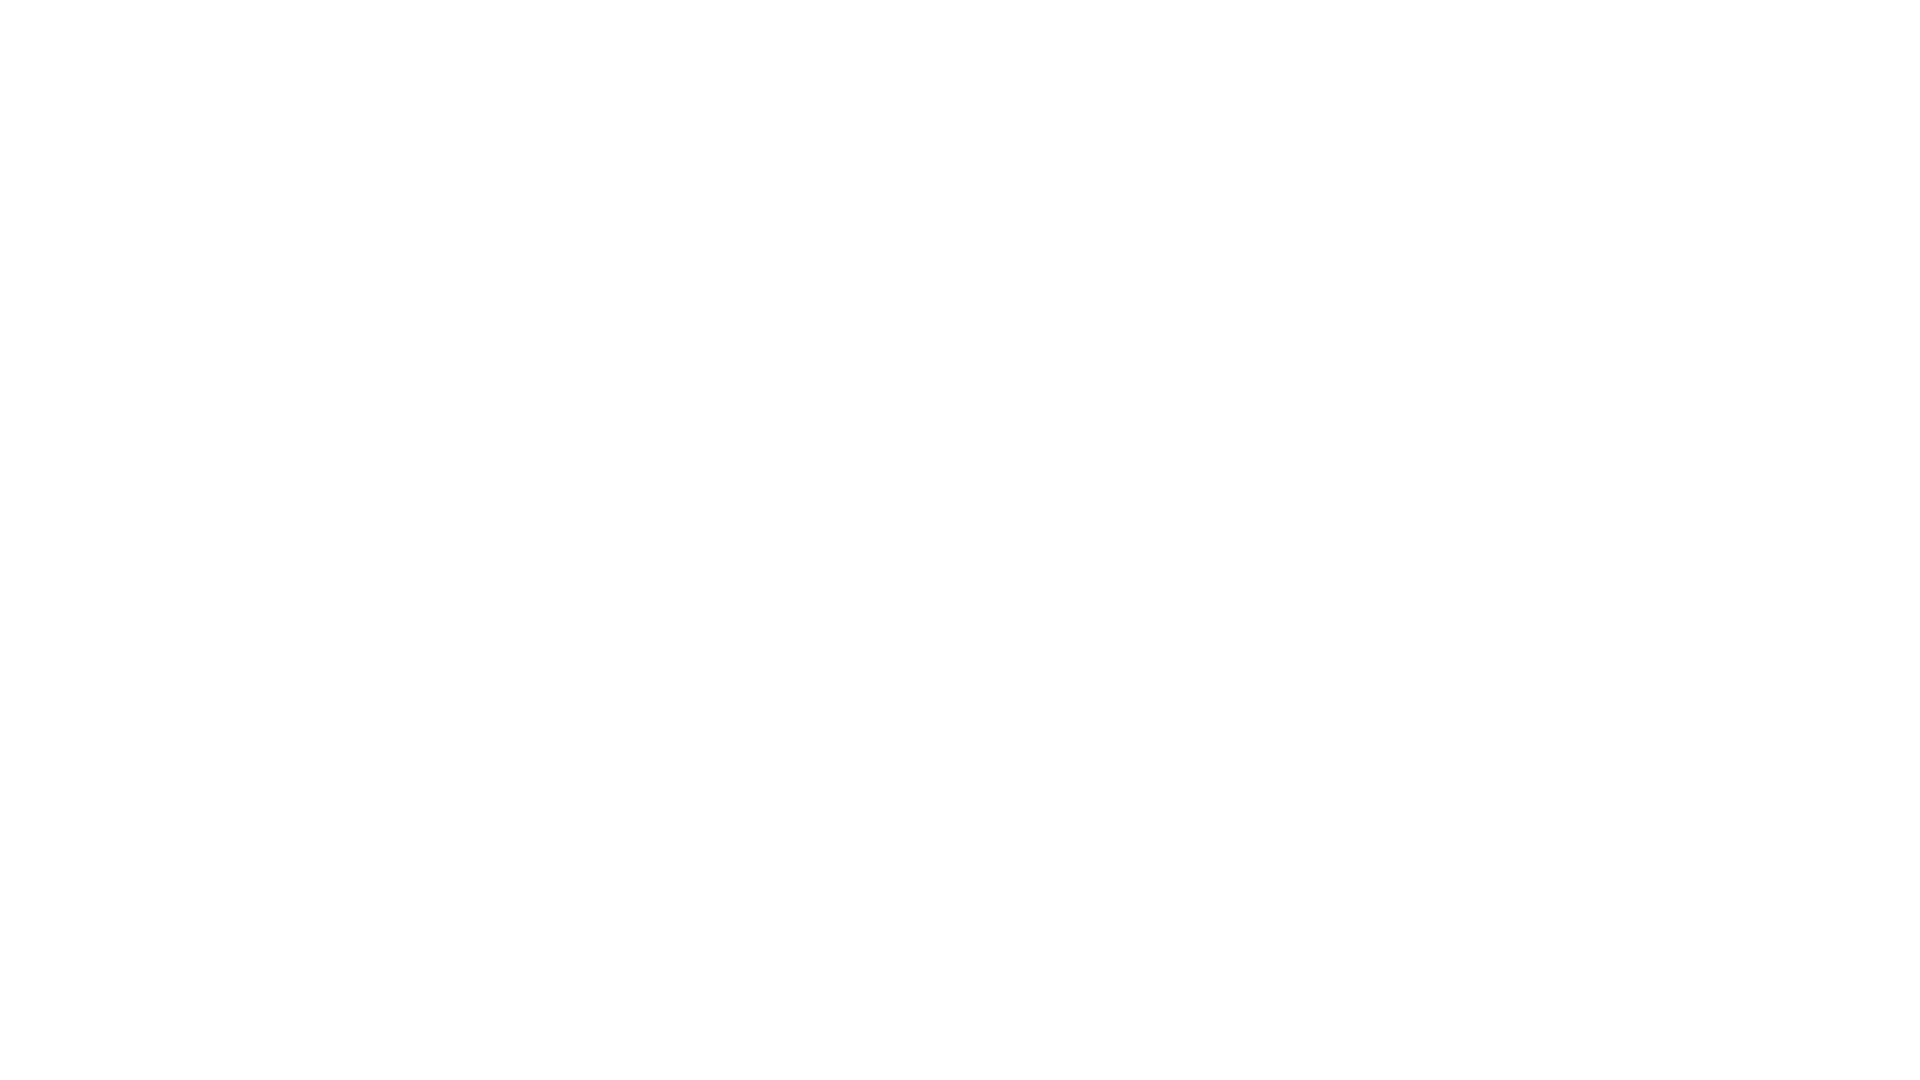 1920x1080-transparent